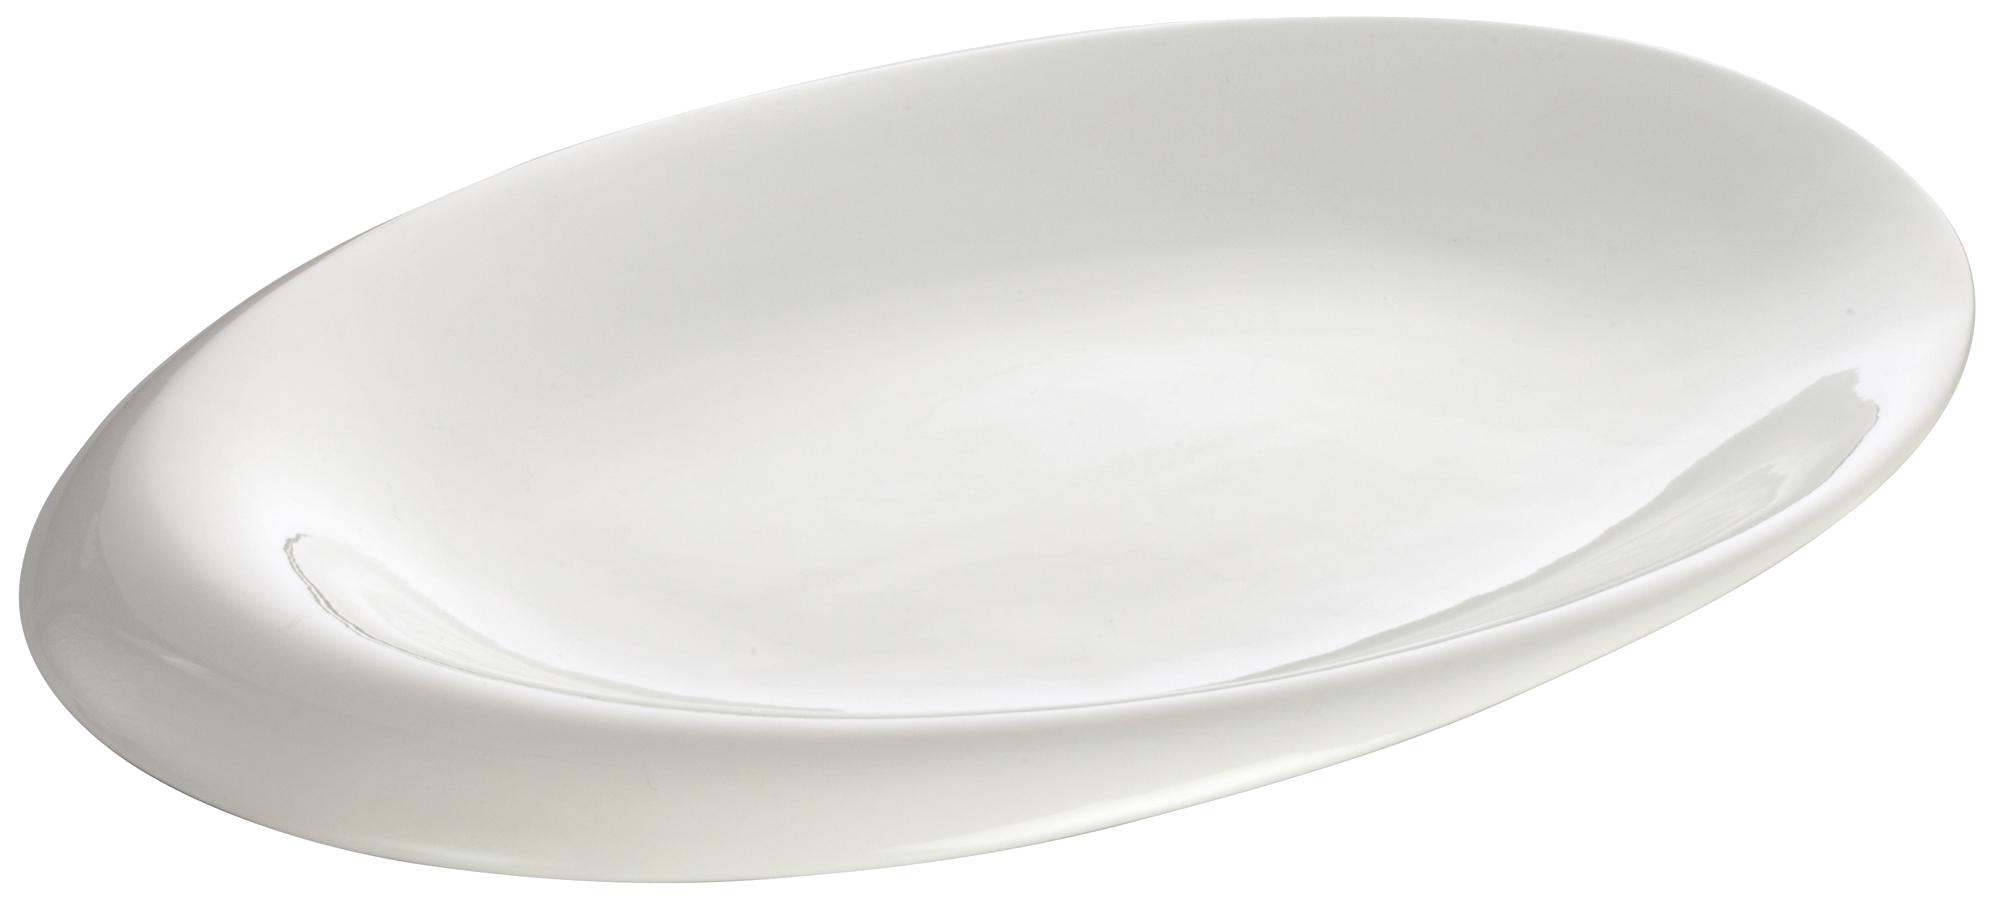 Winco WDP004-213 china, bowl (unknown capacity)